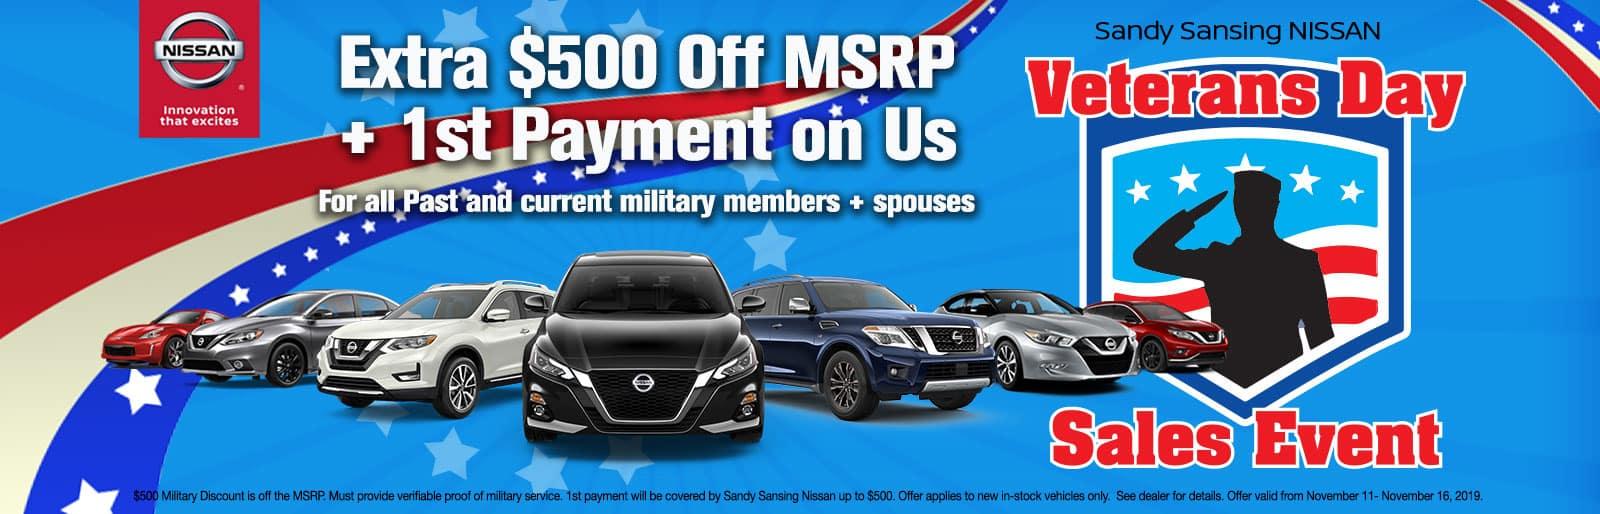 Sandy Sansing Nissan Pensacola FL Veterans Day Sale